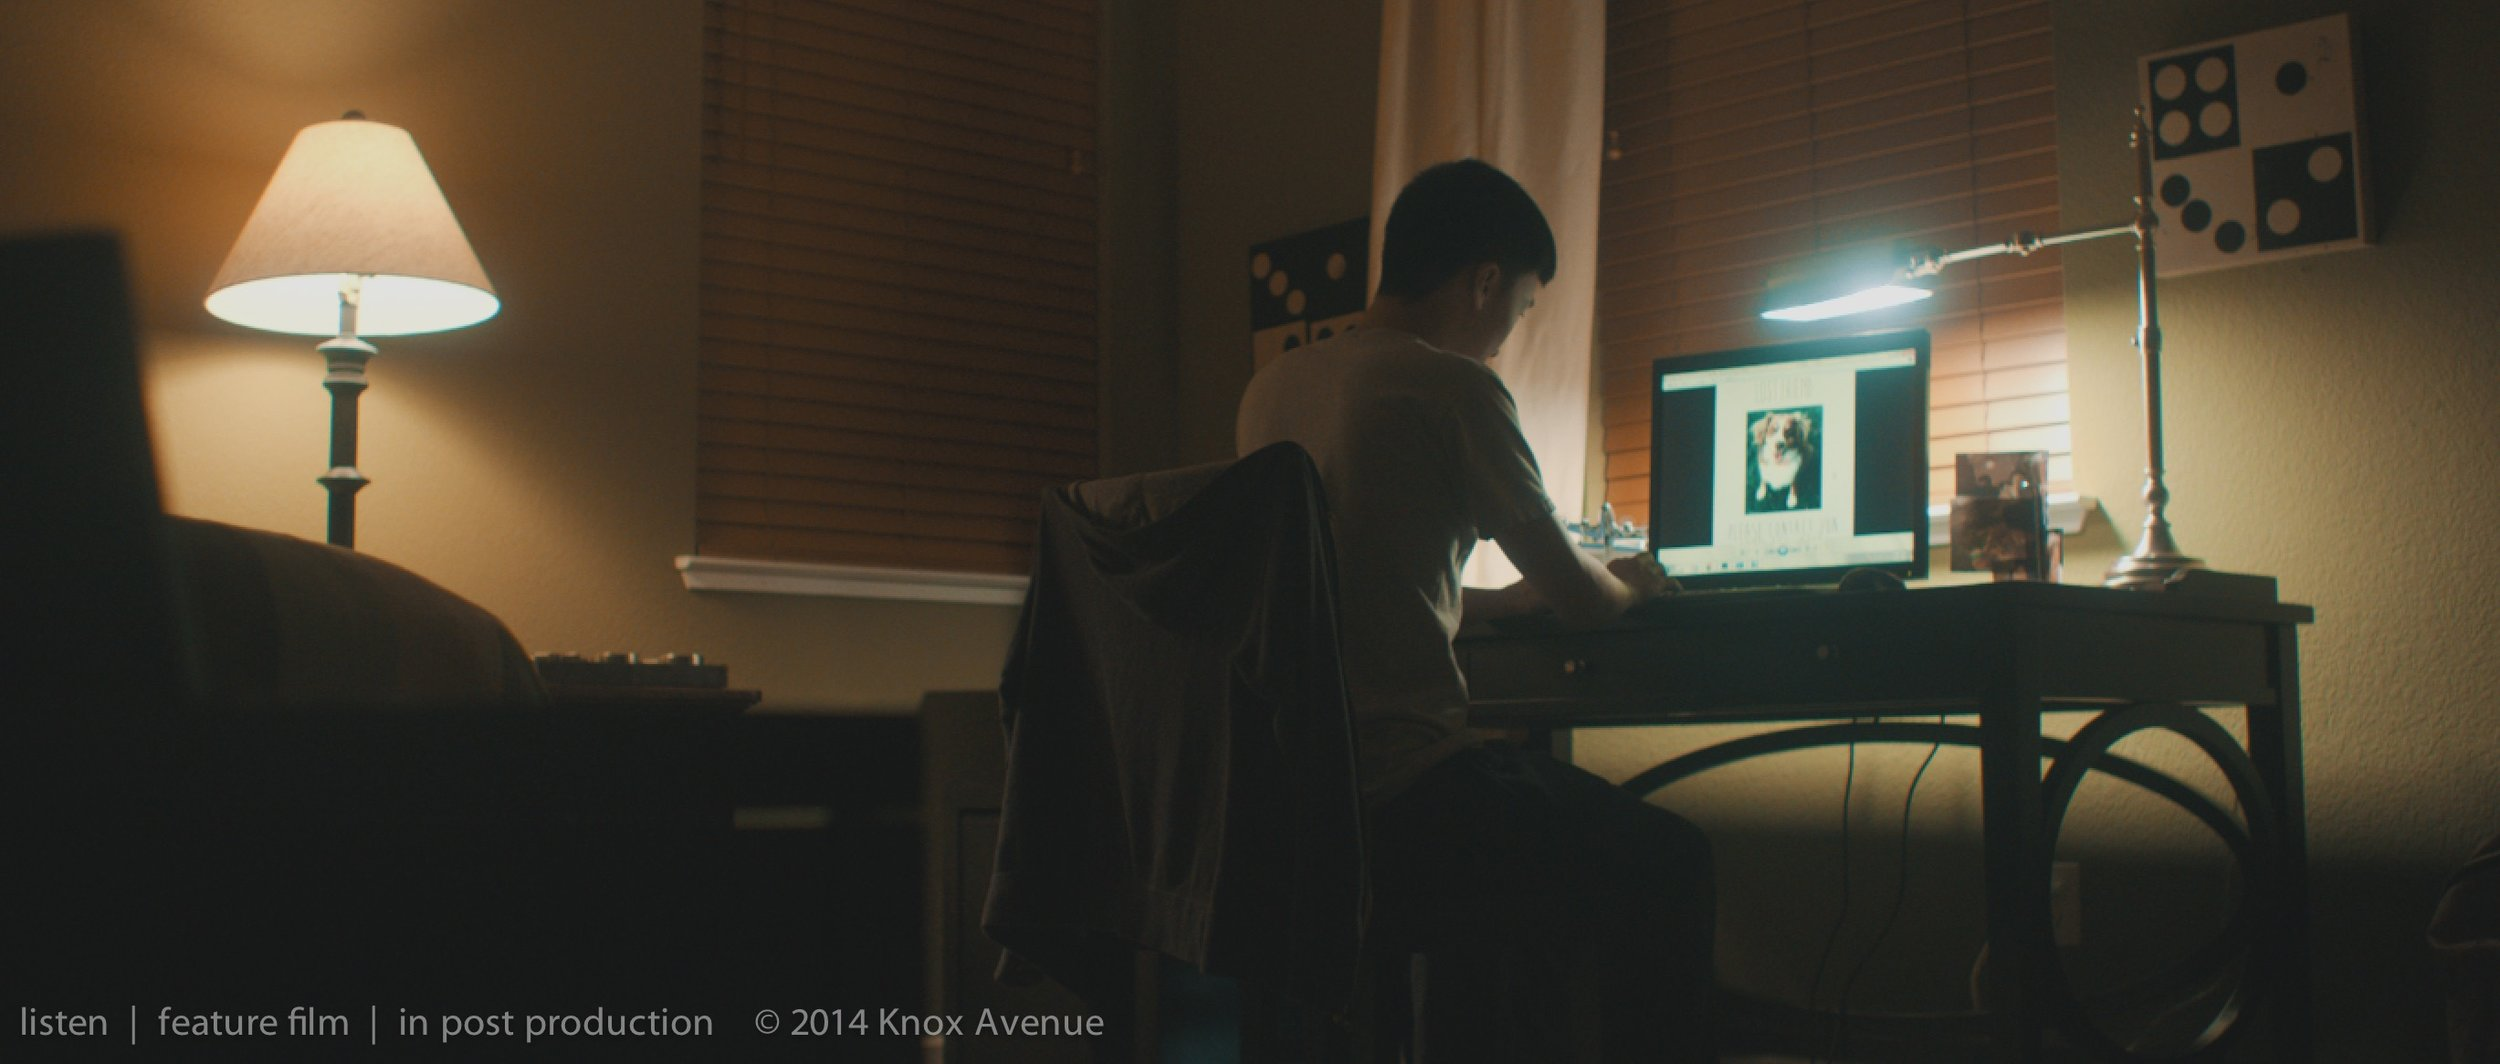 Screen Shot 2014-10-01 at 4.16.31 PM.jpg